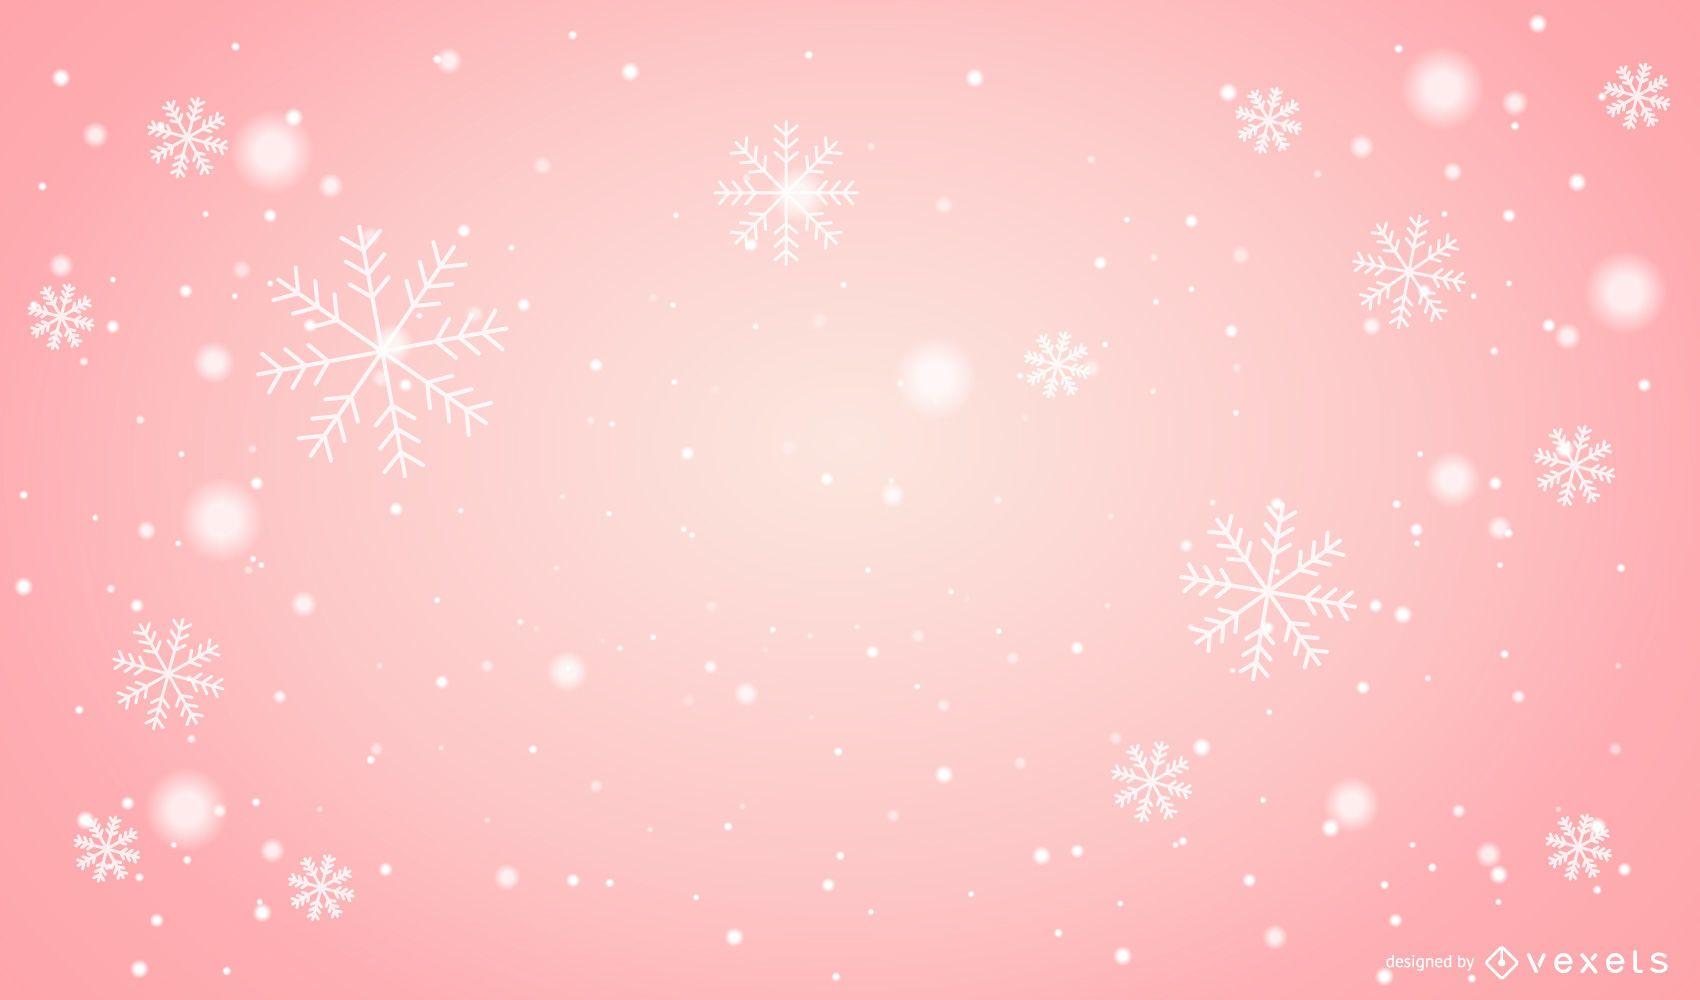 Snowflakes Pink Xmas Background